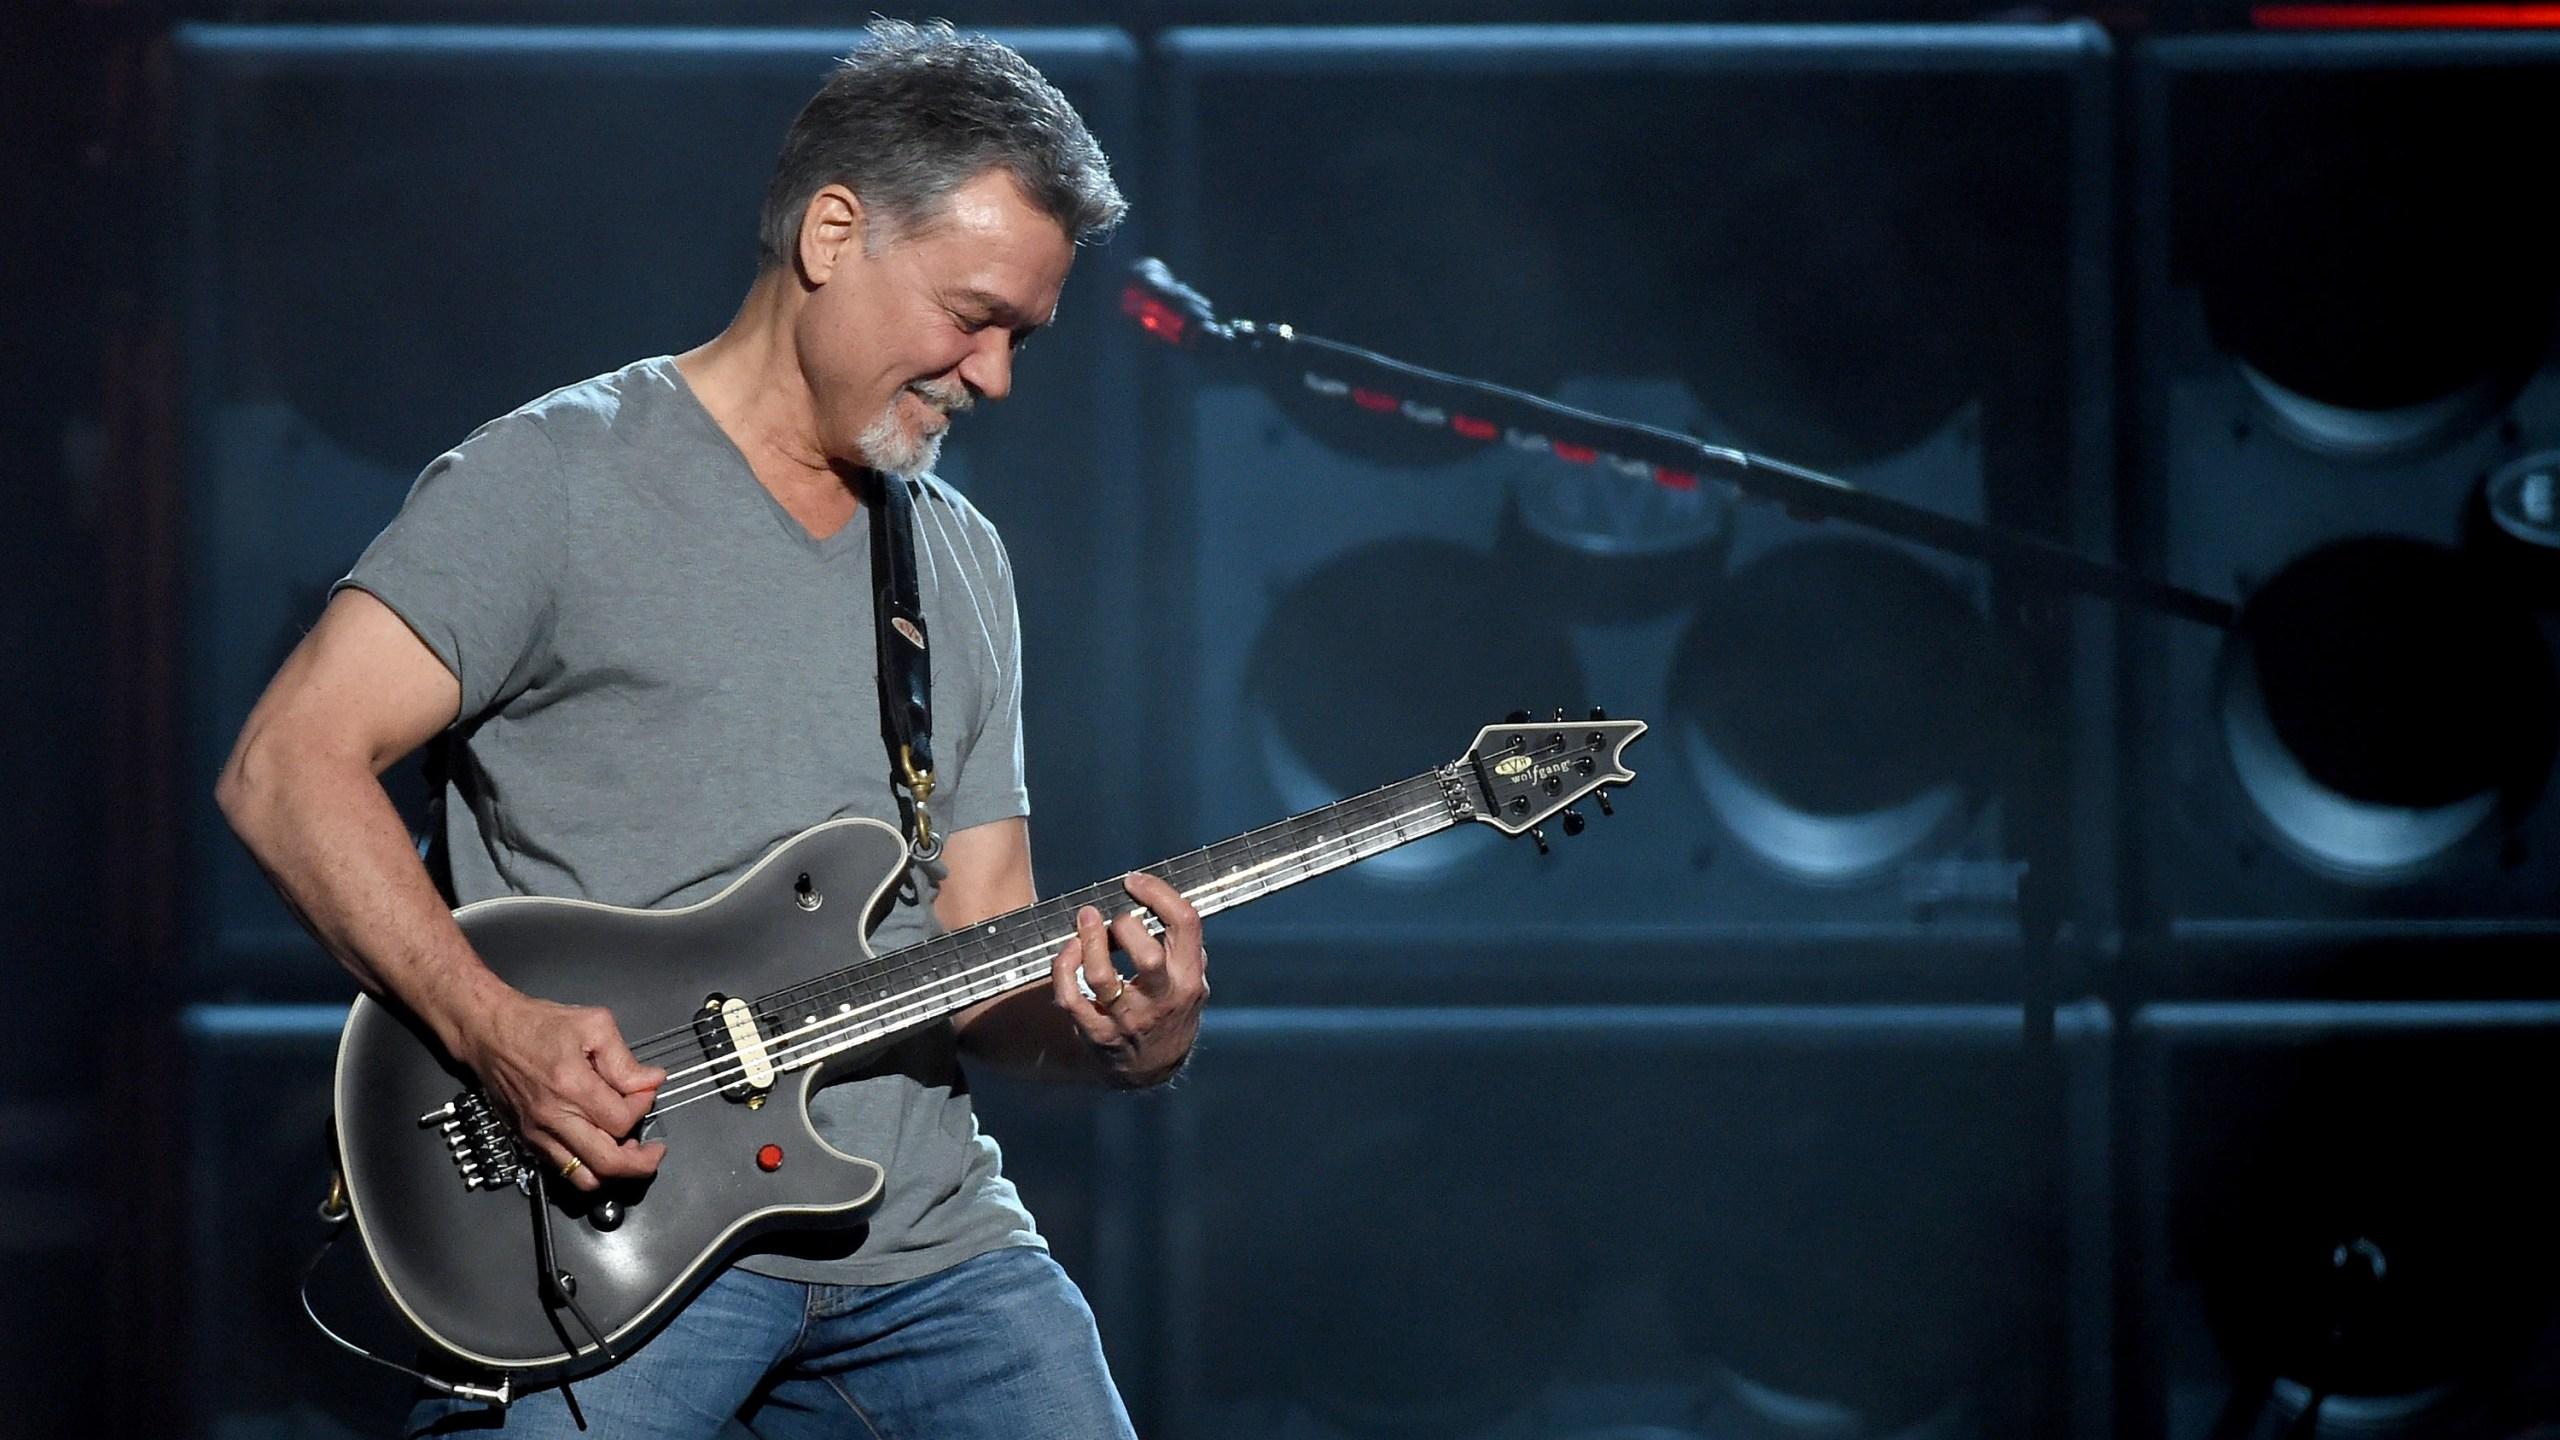 Iconic Rocker Eddie Van Halen Dies Of Cancer At 65 Family Confirms Kget 17